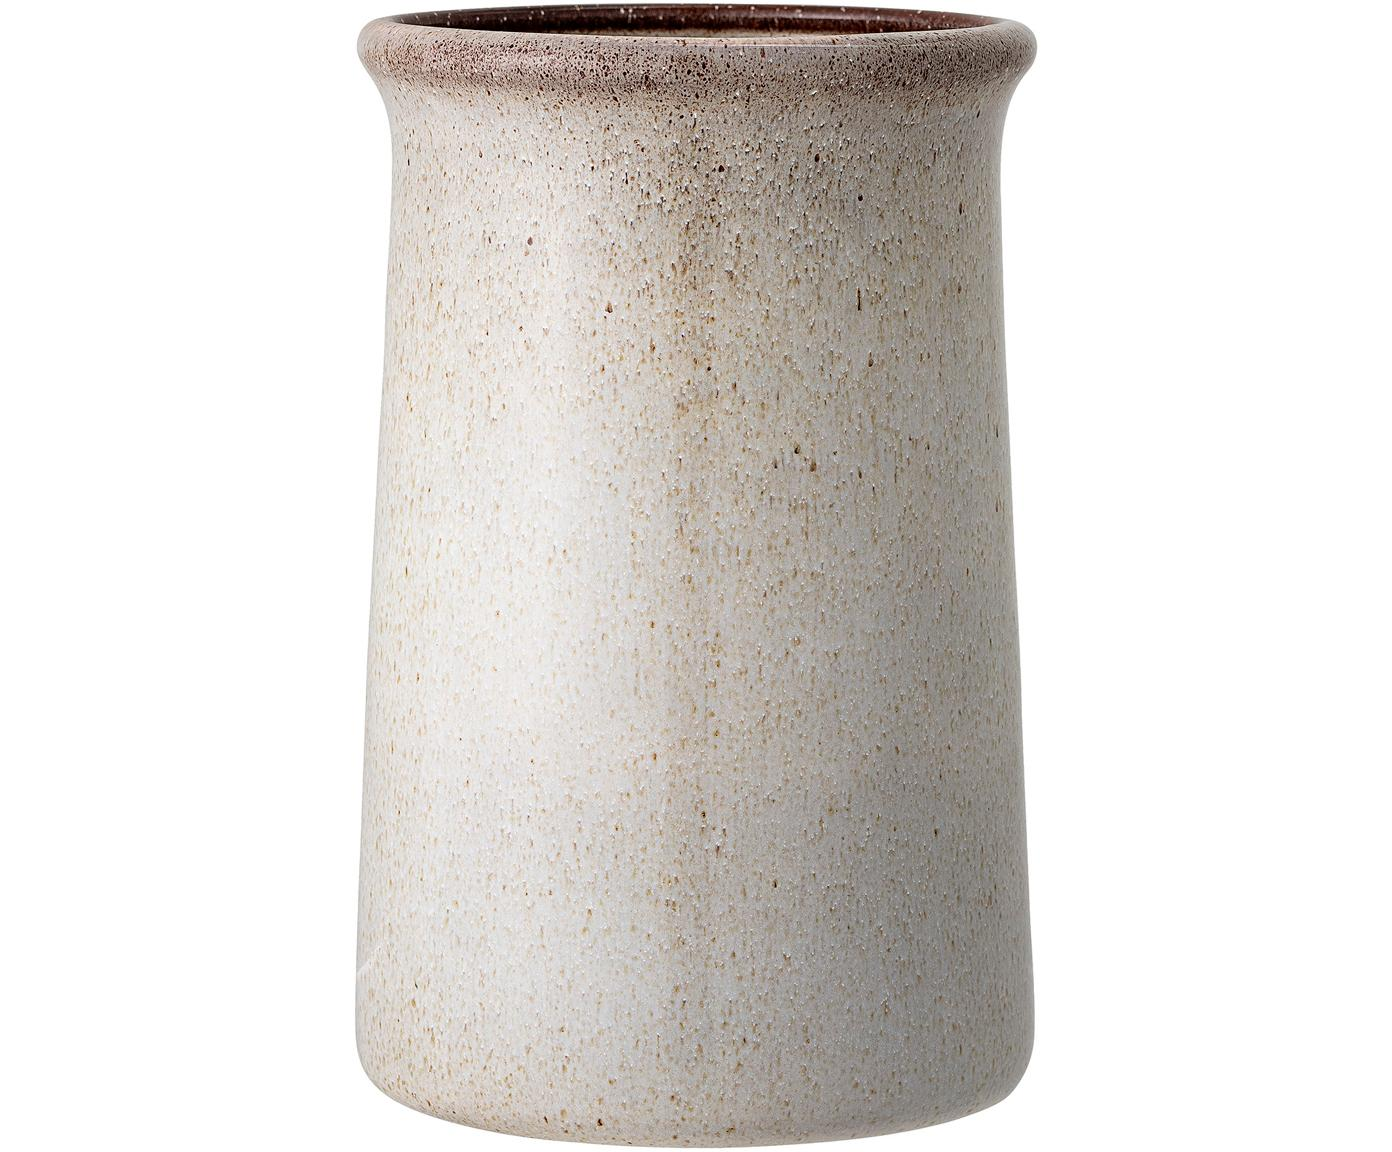 Flessenkoeler Sandrine, Keramiek, Grijs, Ø 15 cm